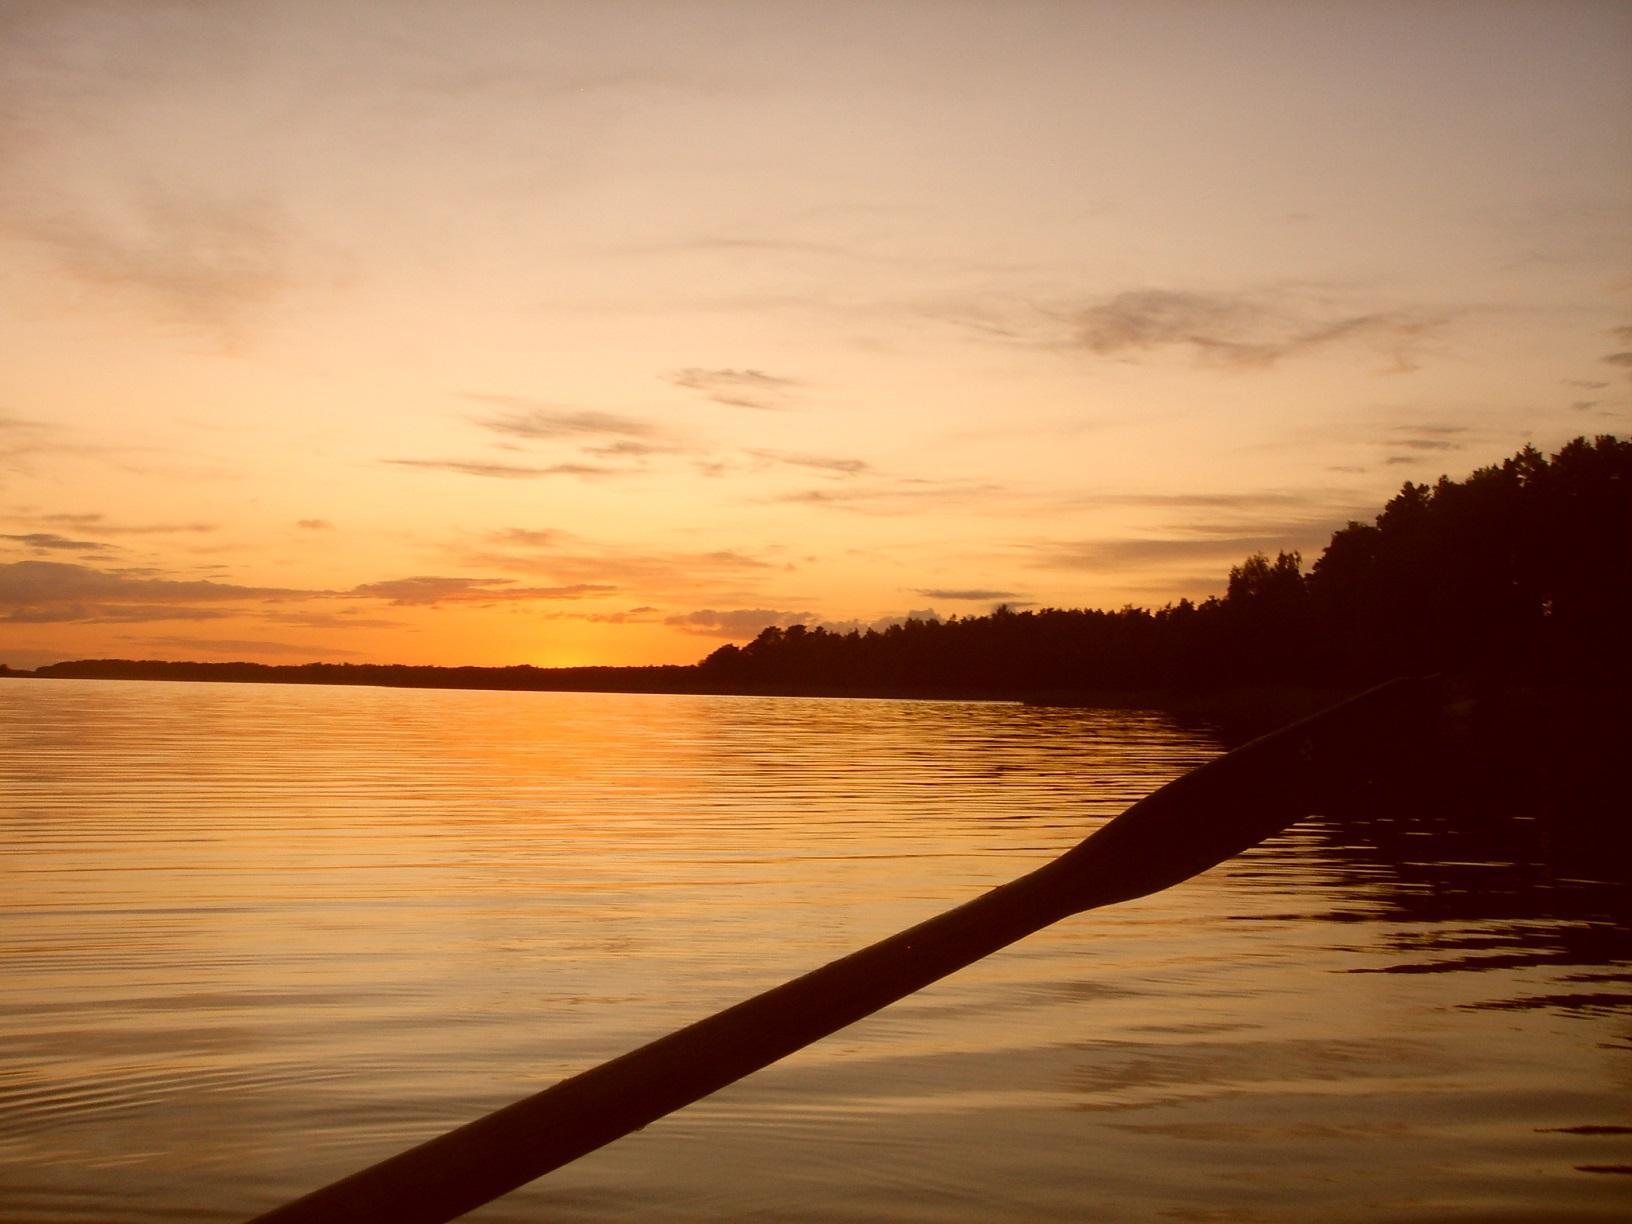 Sonnenuntergang auf Aland